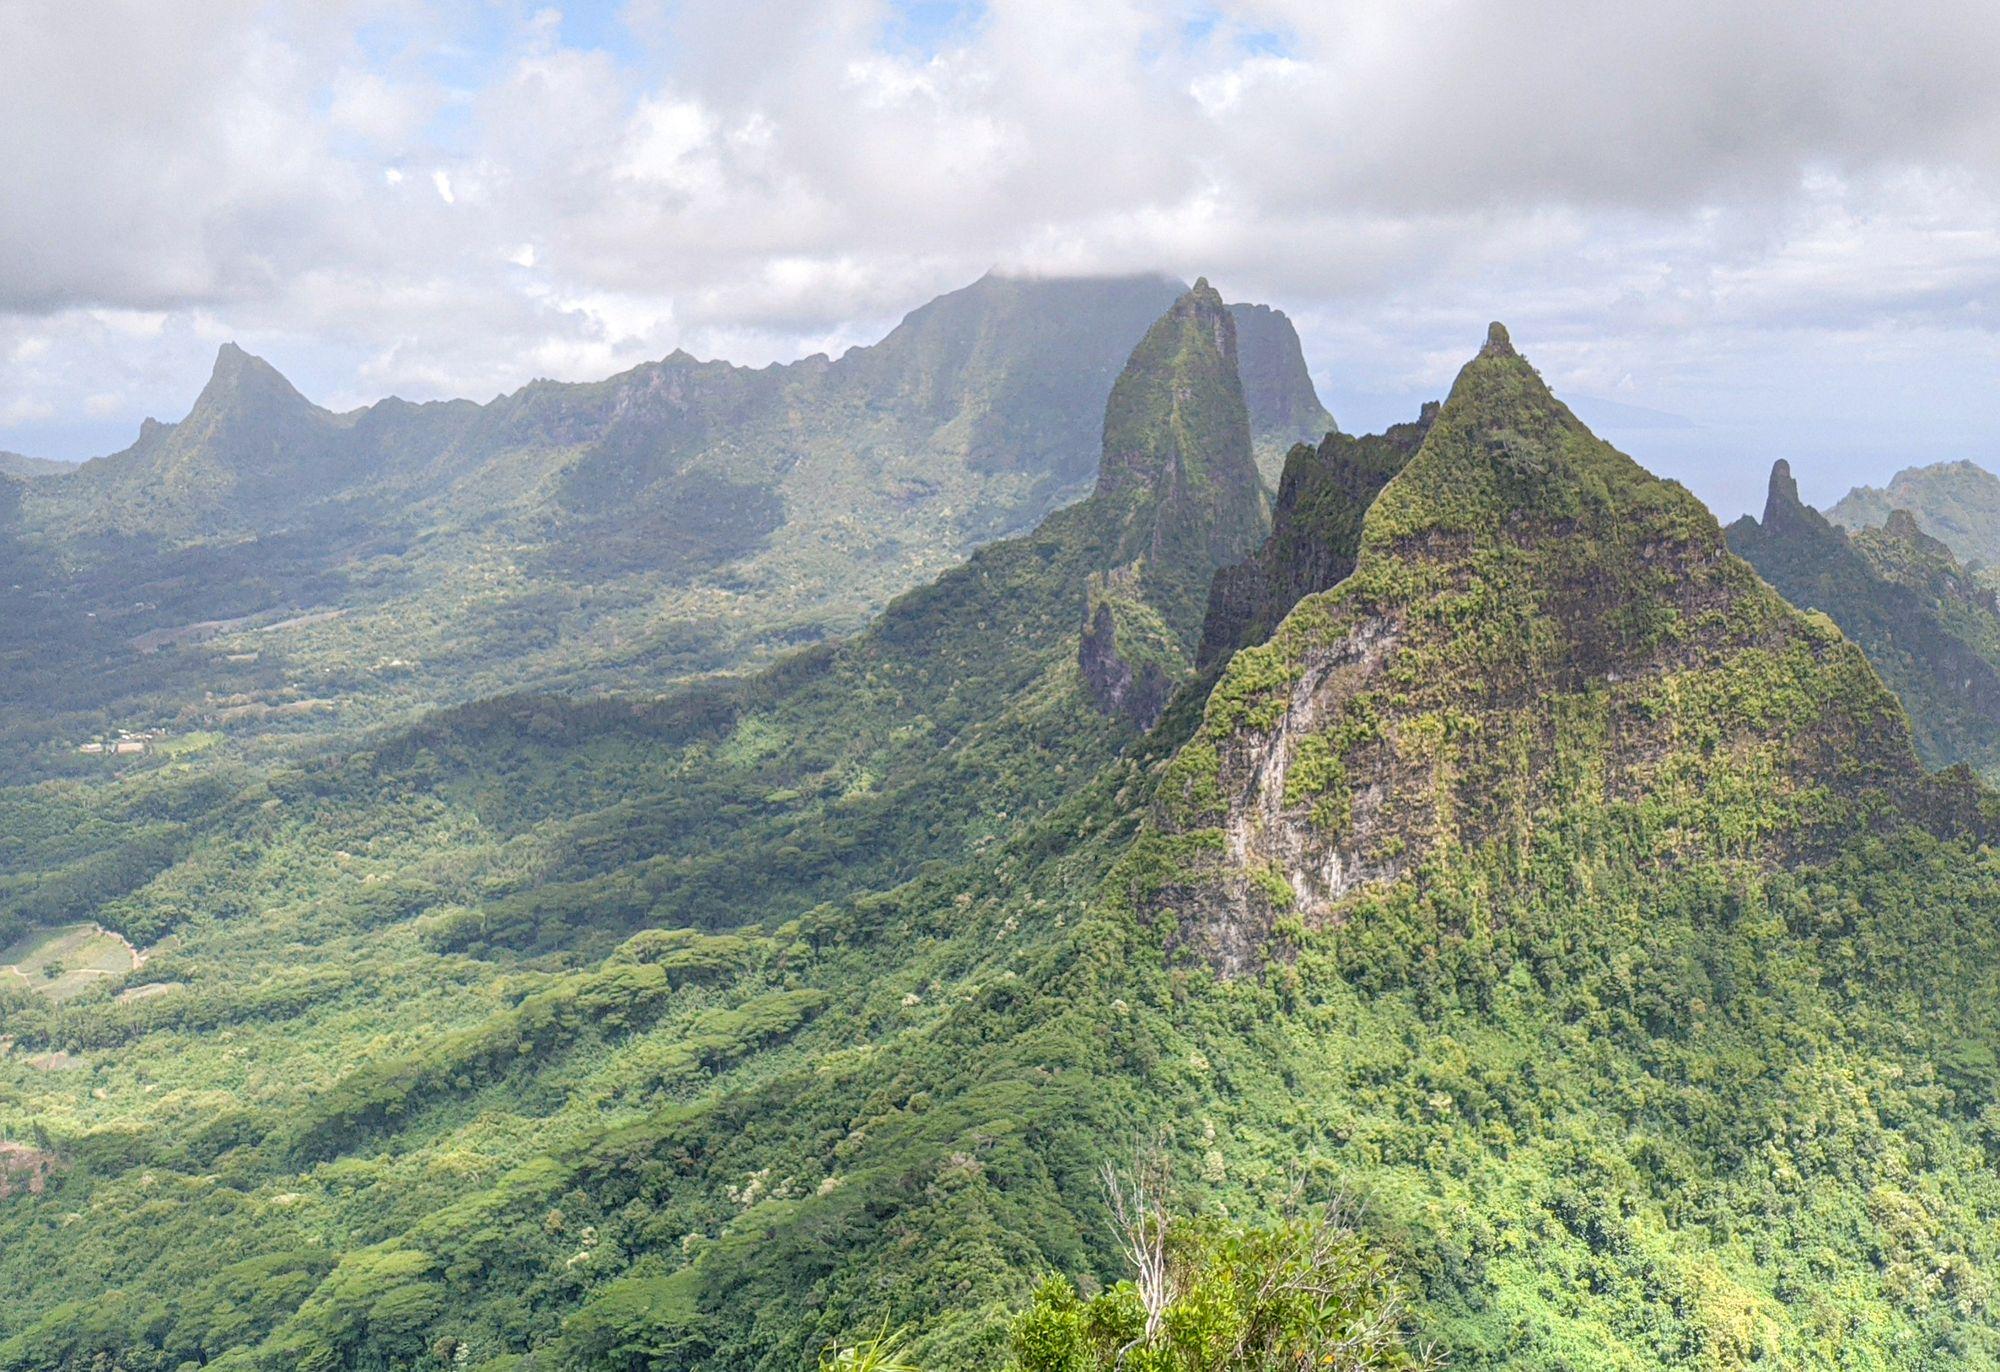 Linareva Pass Uufau Mouapu